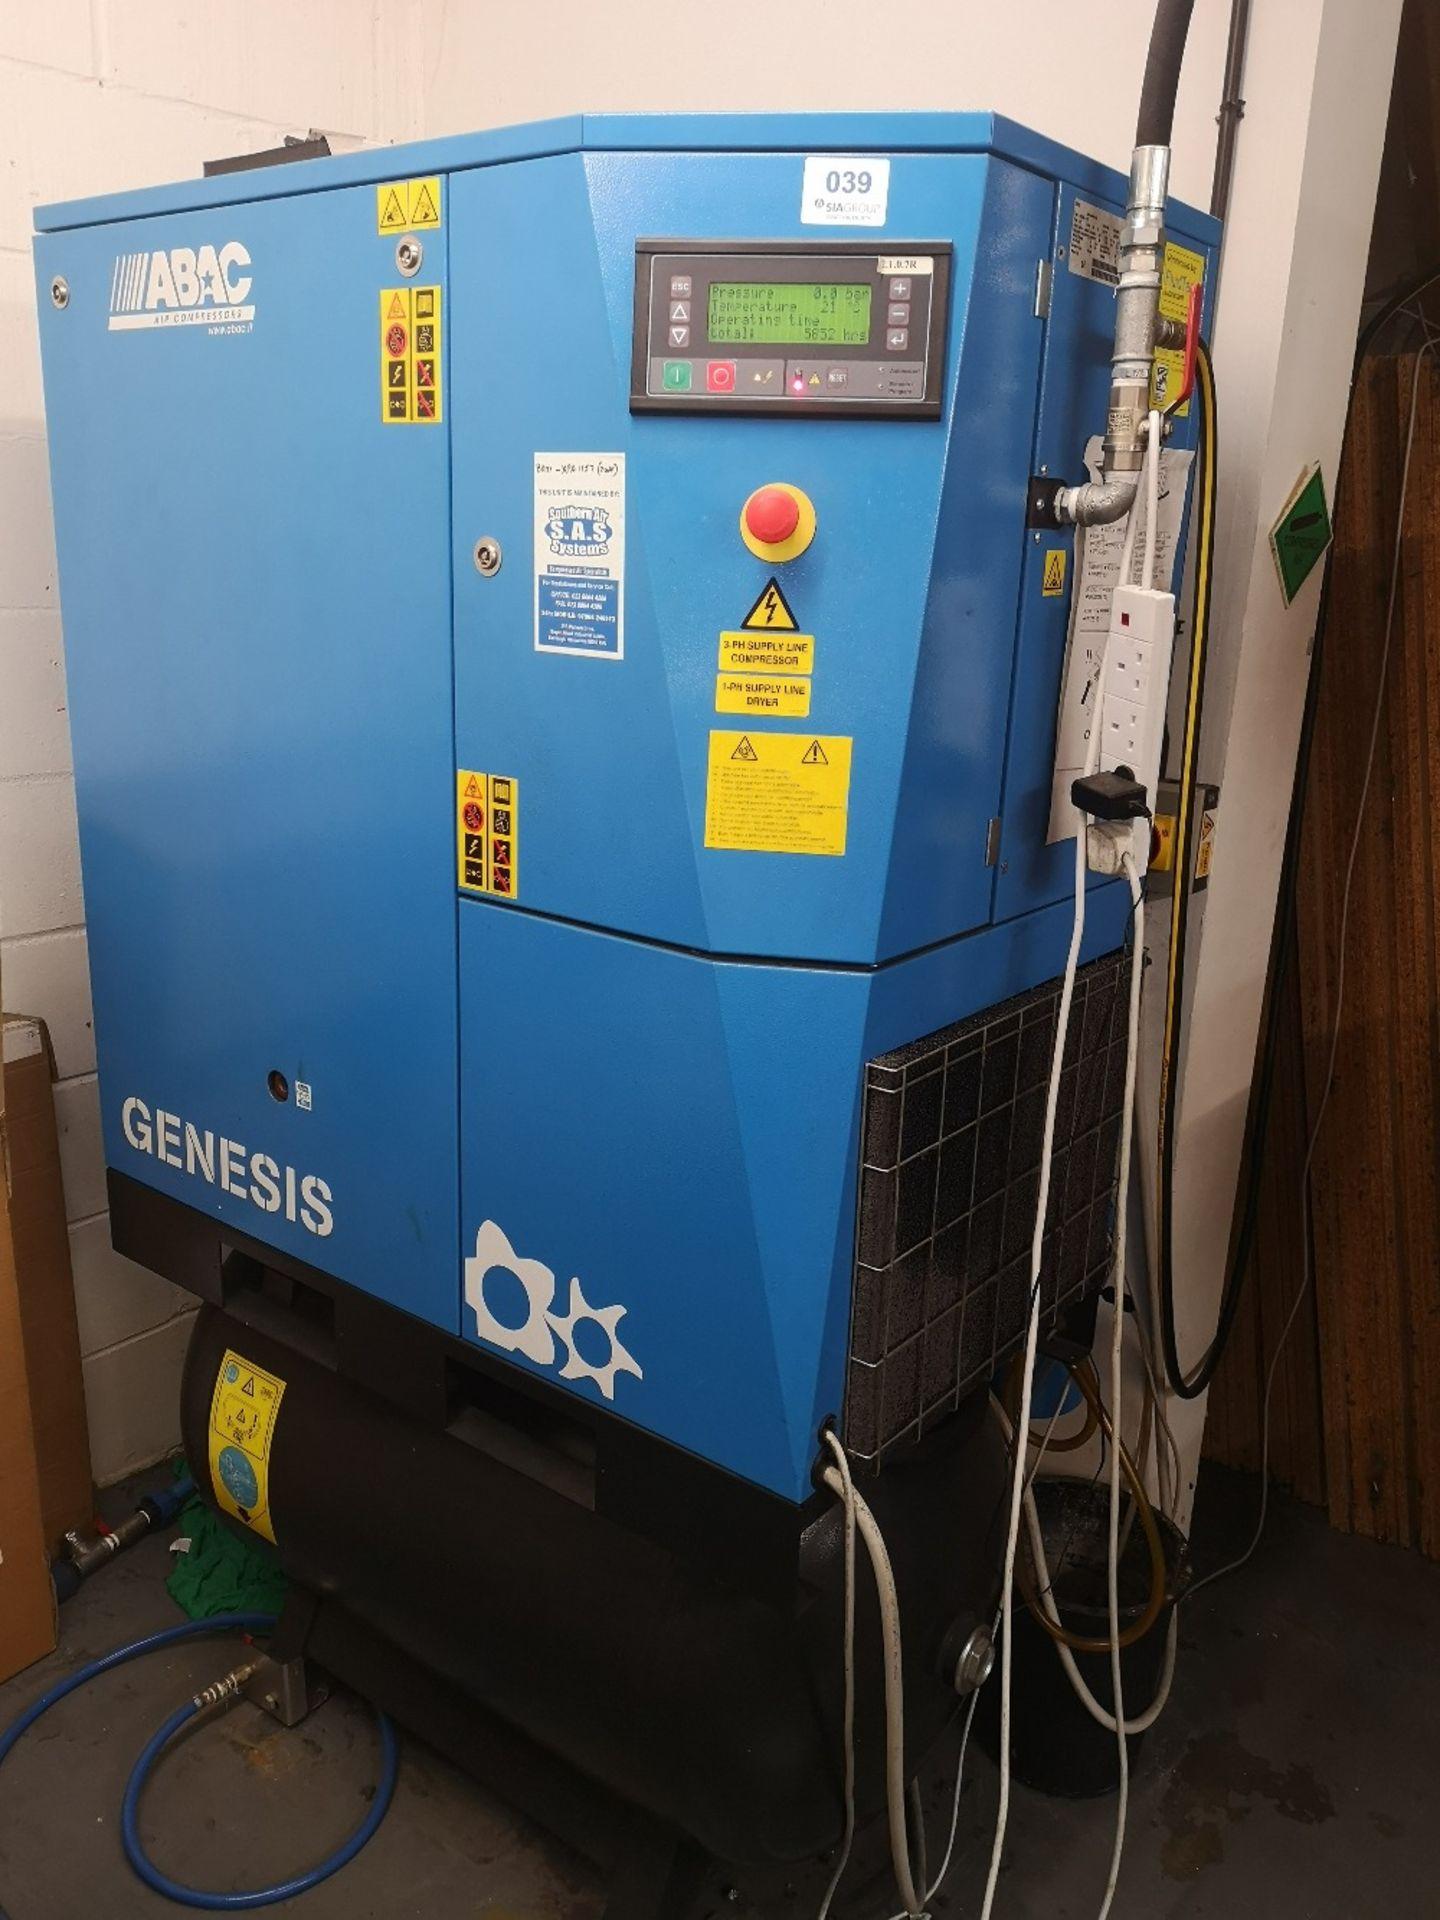 ABAC GENESIS 11 270 Variable Speed Rotary Screw Air Compressor